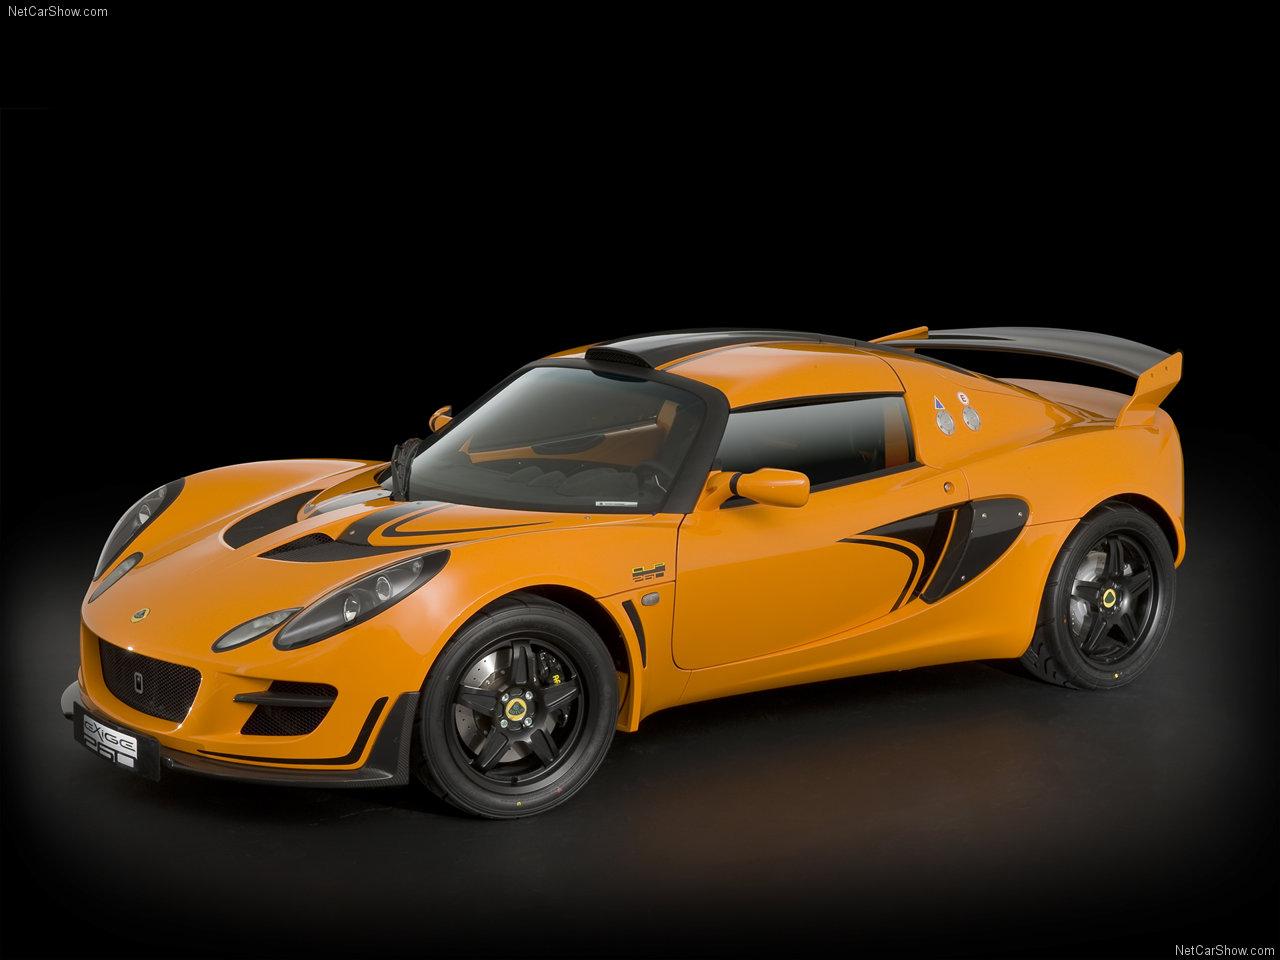 lotus auto car 2010 lotus exige cup 260. Black Bedroom Furniture Sets. Home Design Ideas